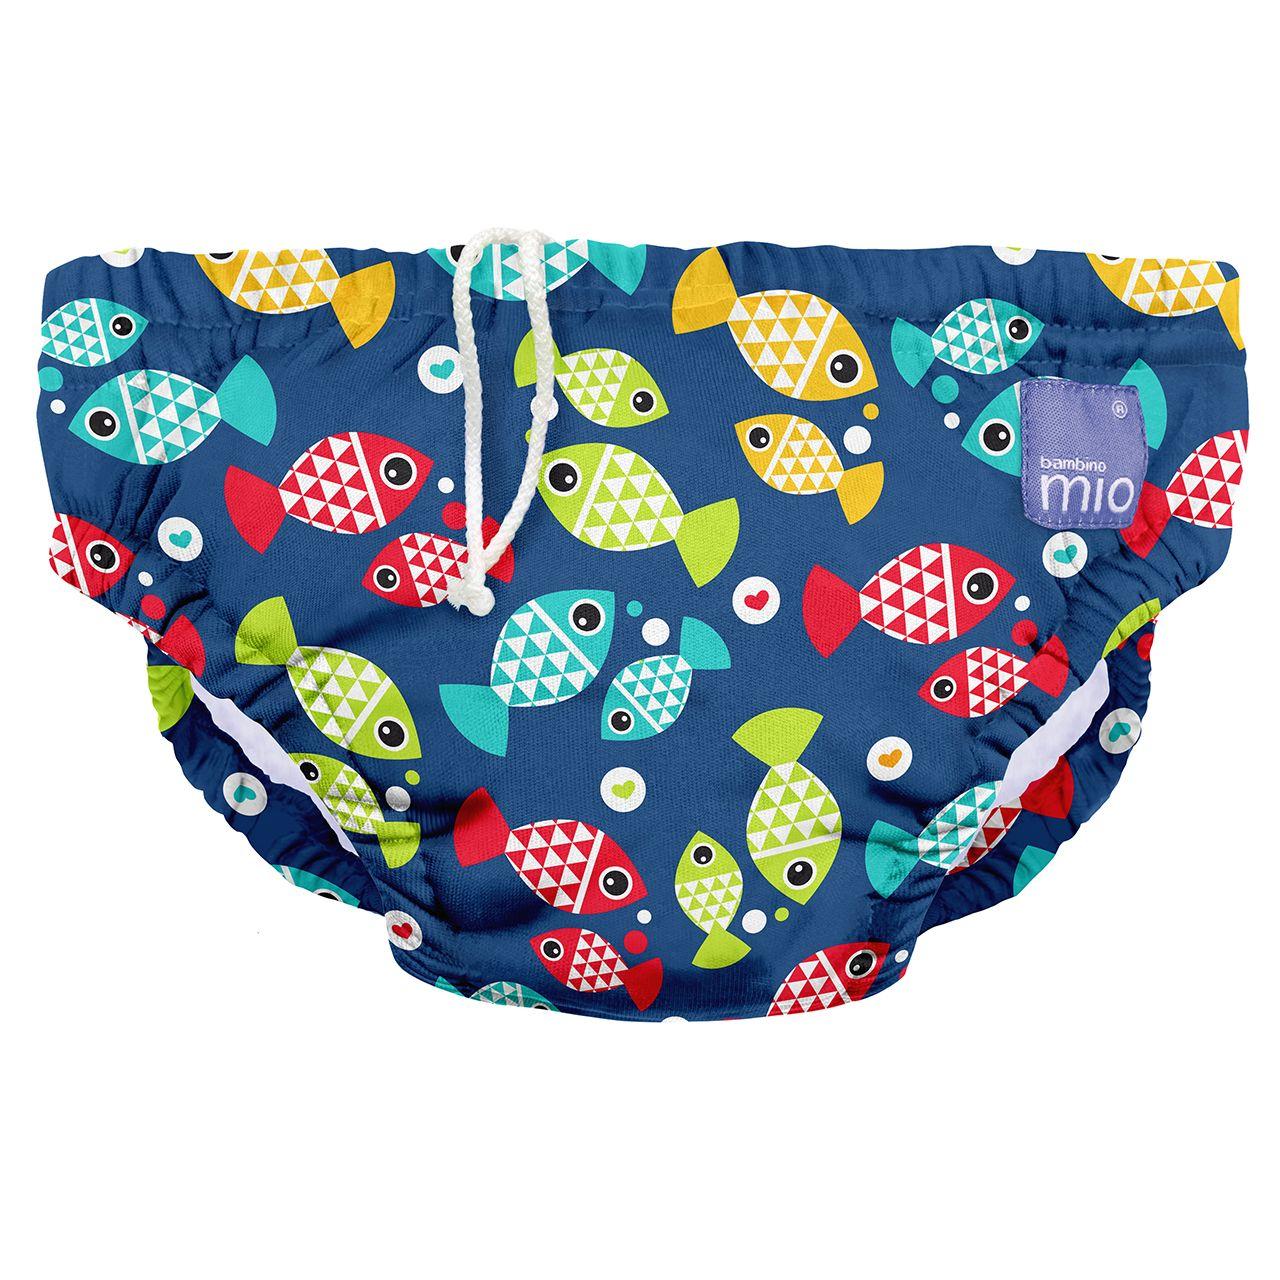 Reusable Eco Swim Nappy Swim Wear Choose from Bambino Mio Reusable Swim Nappy